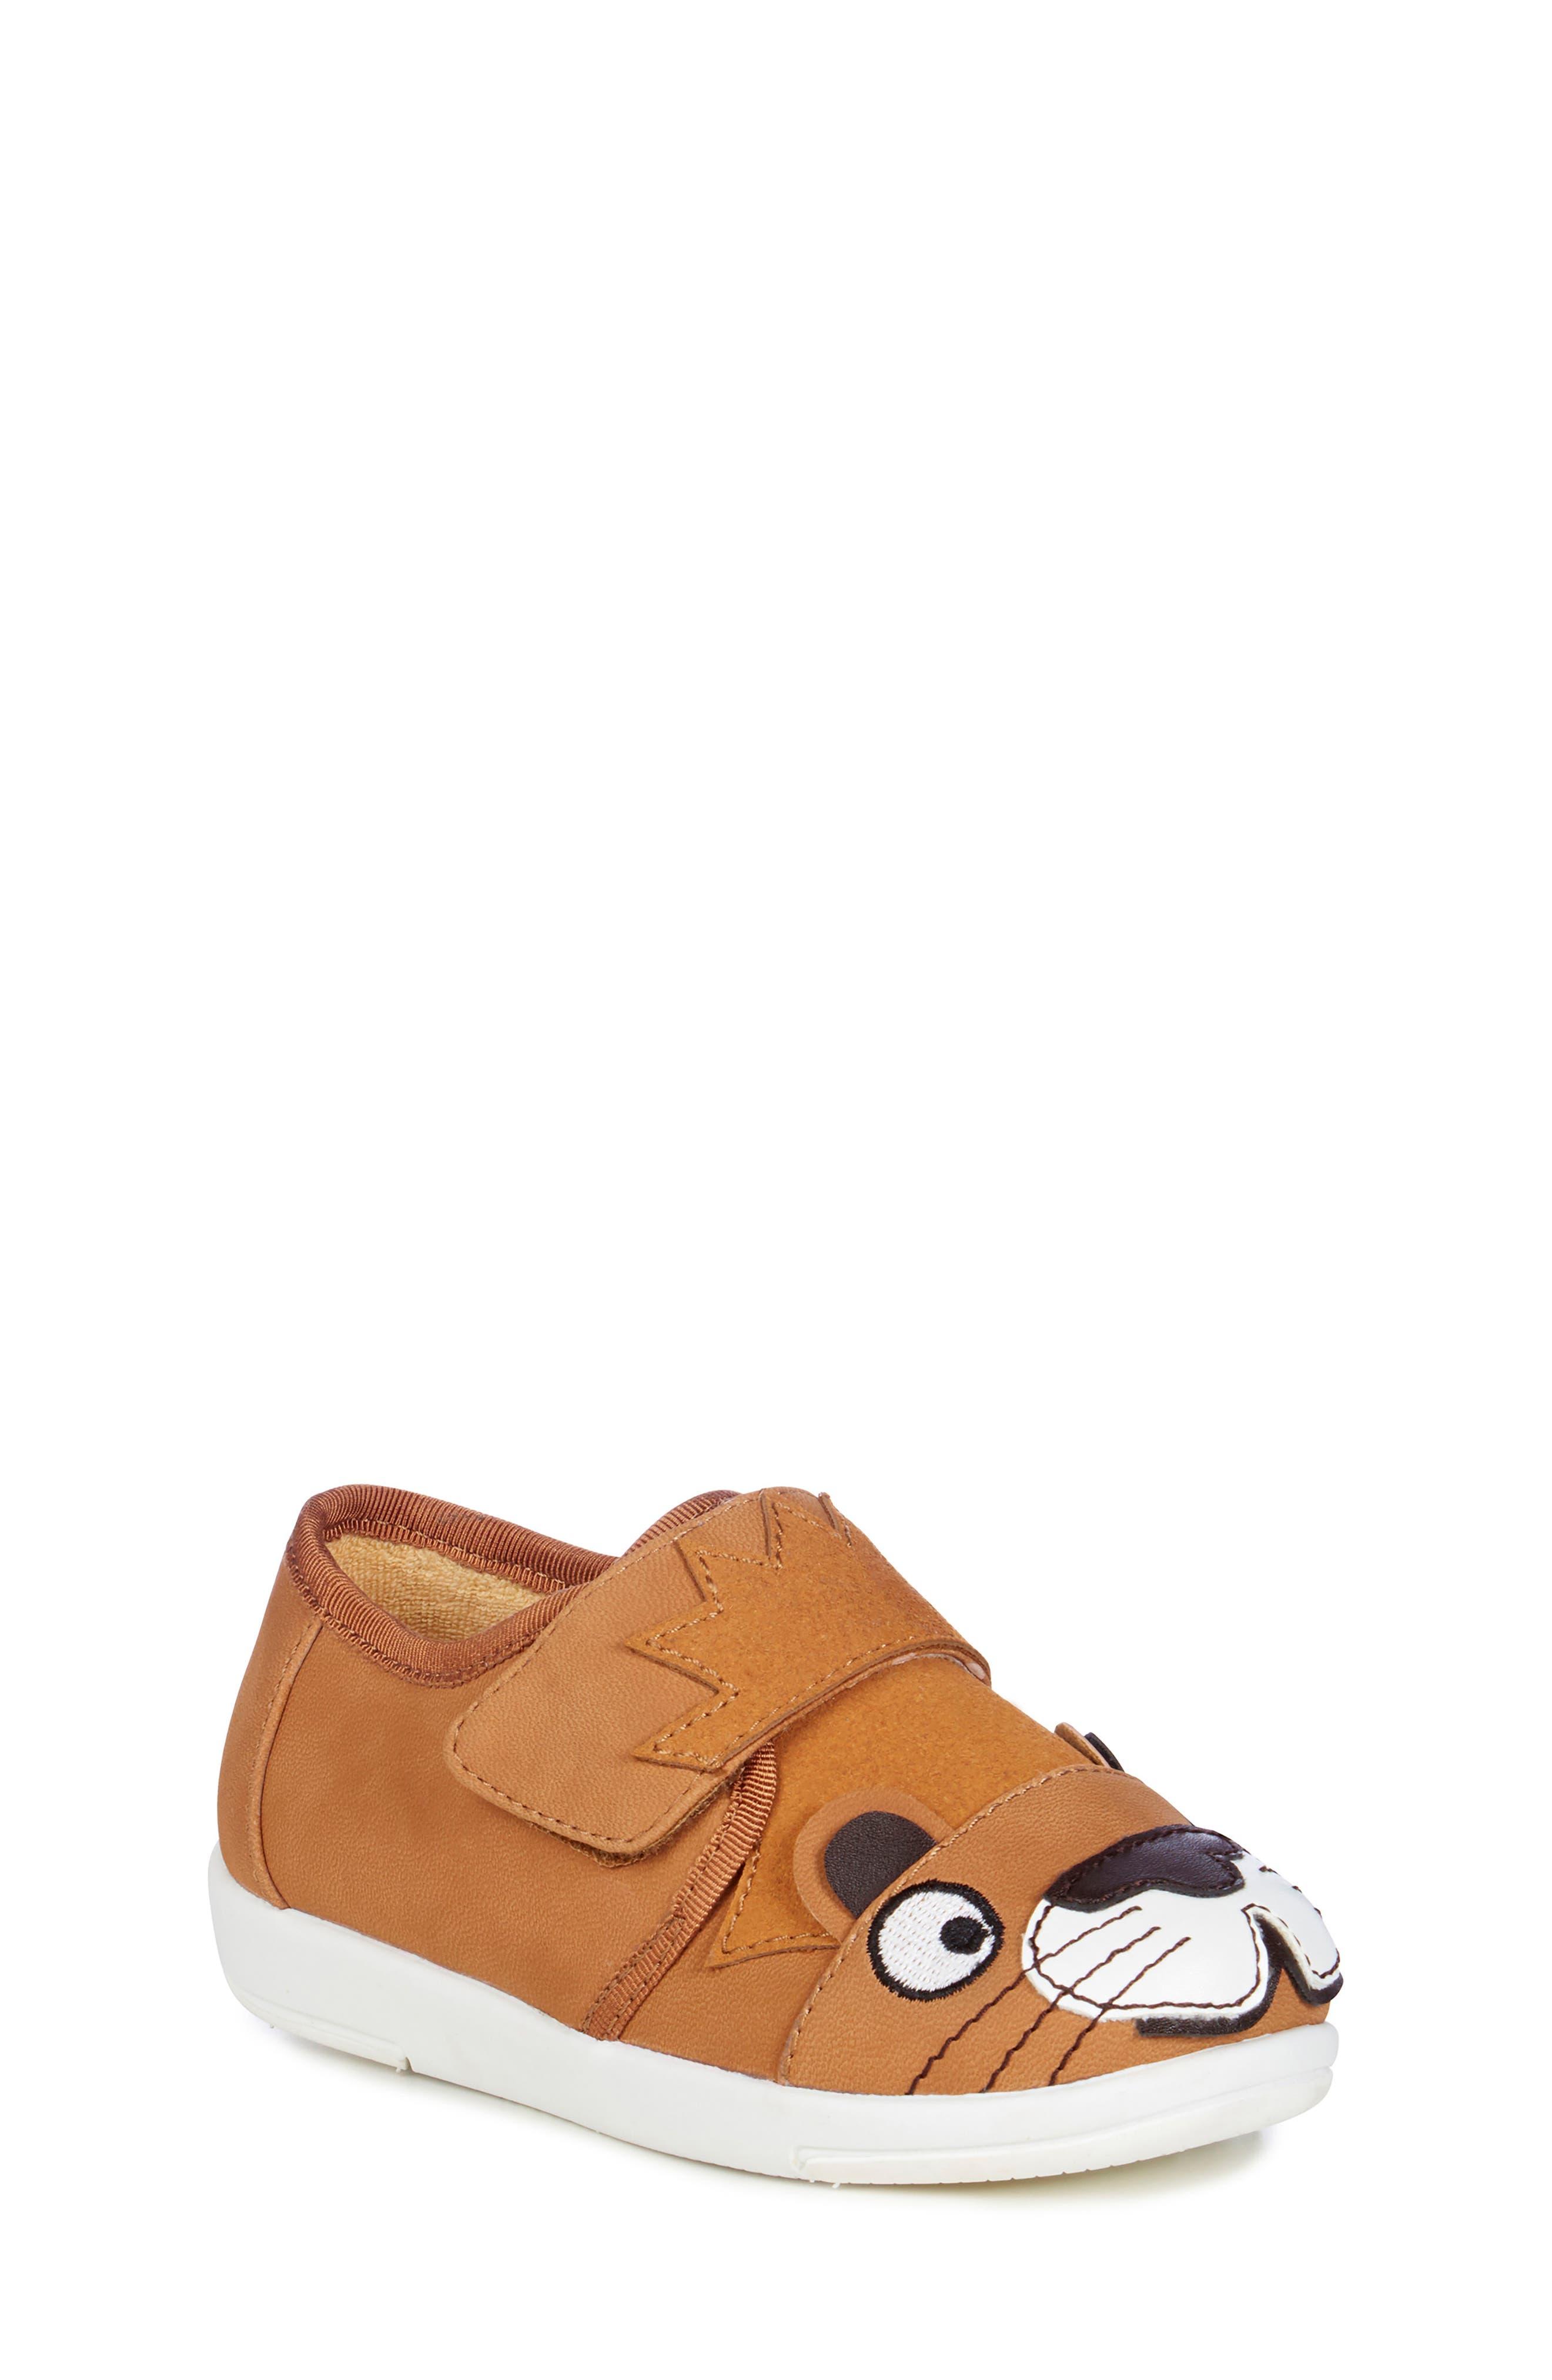 EMU AUSTRALIA,                             Sneaker,                             Main thumbnail 1, color,                             200